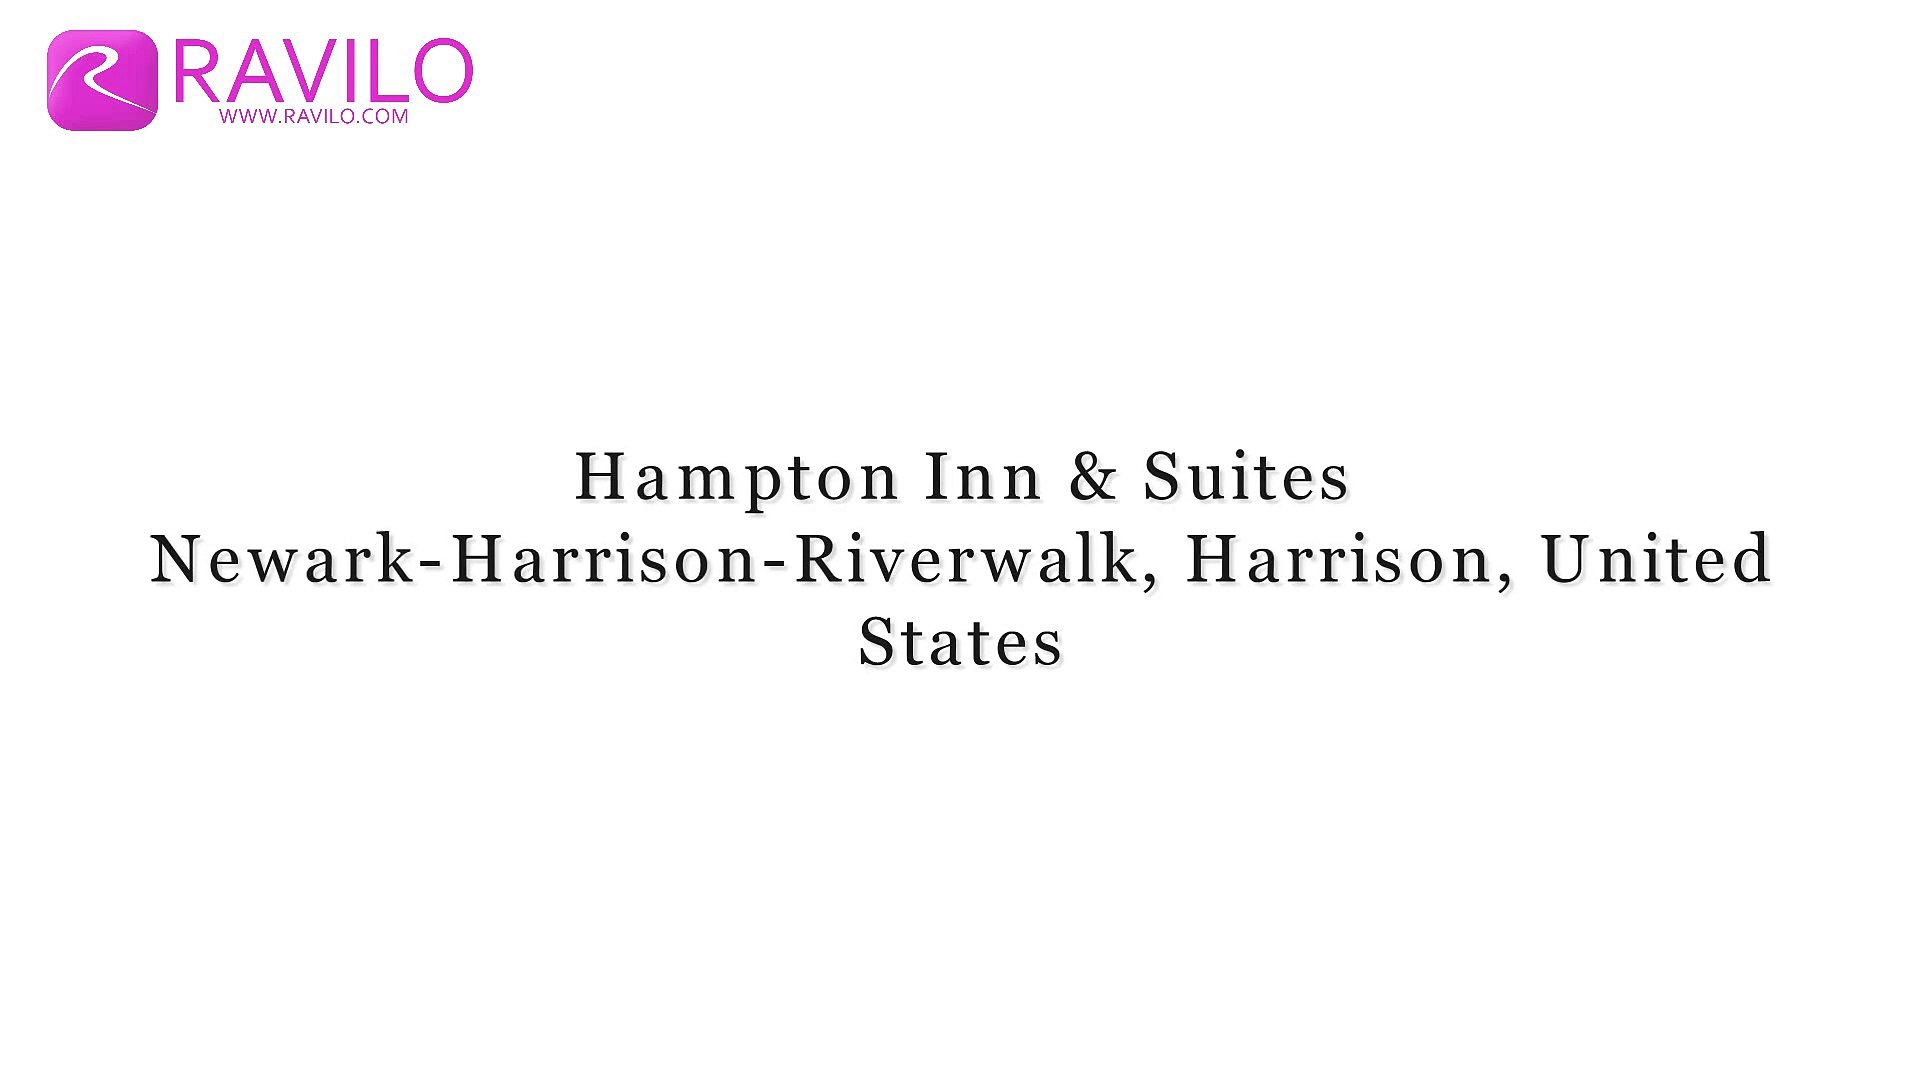 Hampton Inn & Suites Newark-Harrison-Riverwalk, Harrison, United States